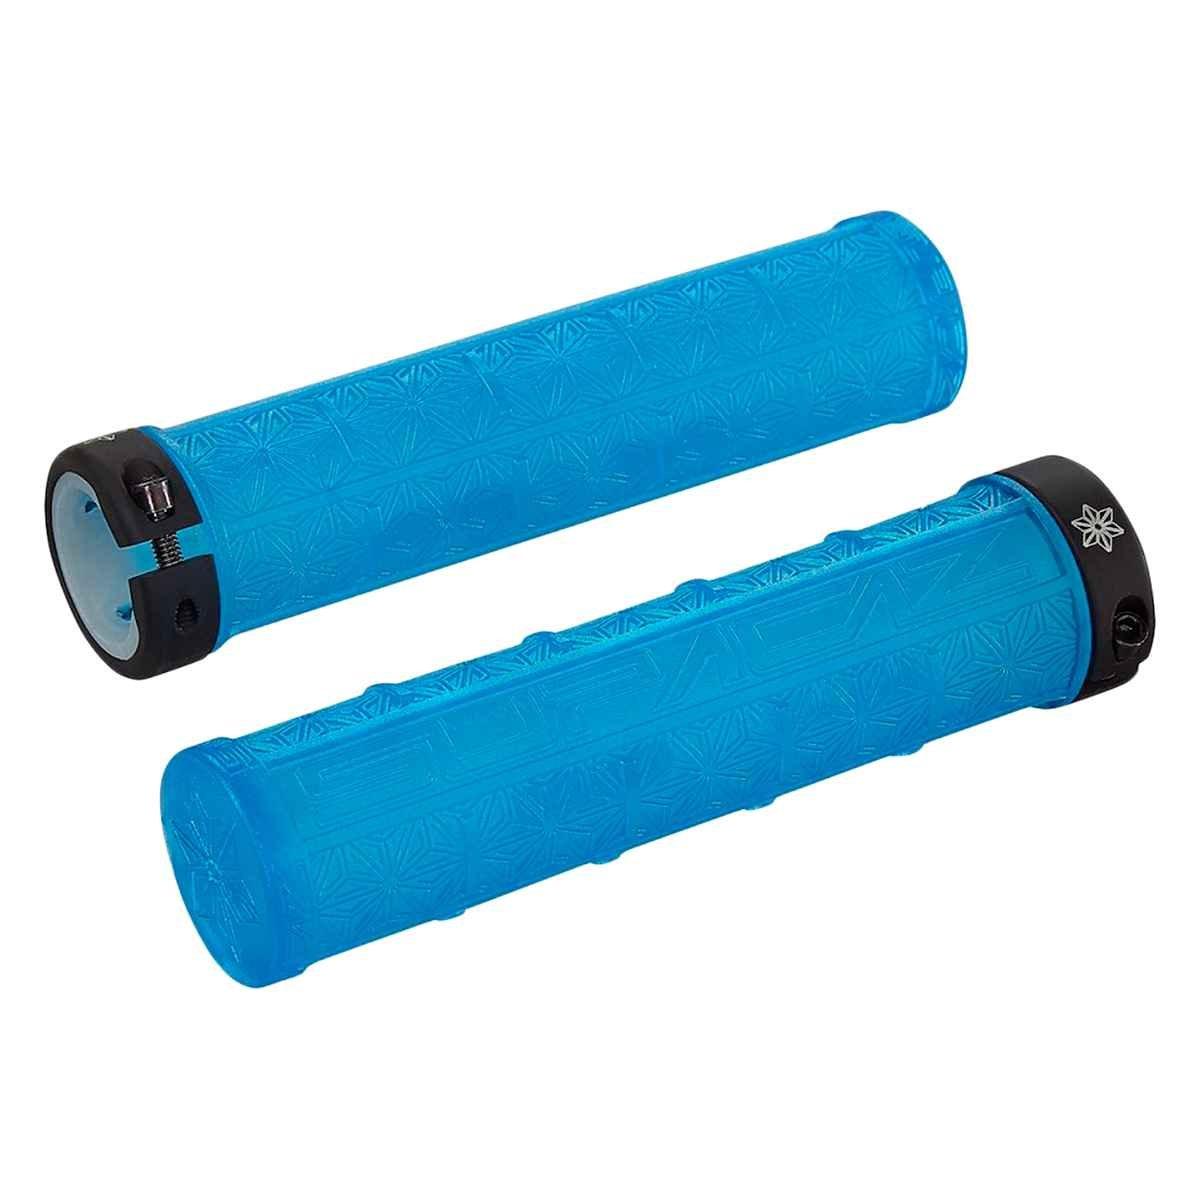 Supacaz Grizips – すべての色 B06Y2H667L Neon Blue Clear Neon Blue Clear